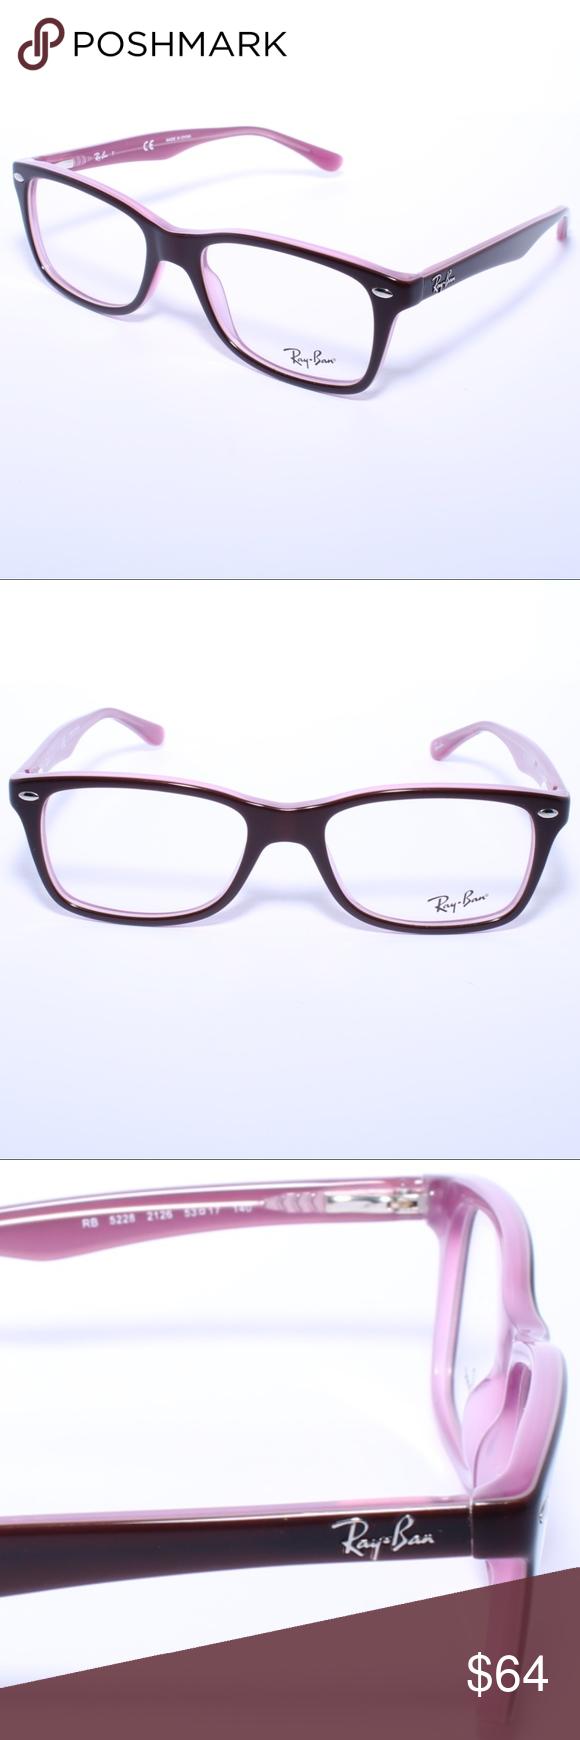 62b1a5dbde RayBan RB5228 2126 Eggplant Pink Eyeglasses RayBan RB5228 2126  Eggplant Pink Eyeglasses 53 17mm Comes with Generic Case